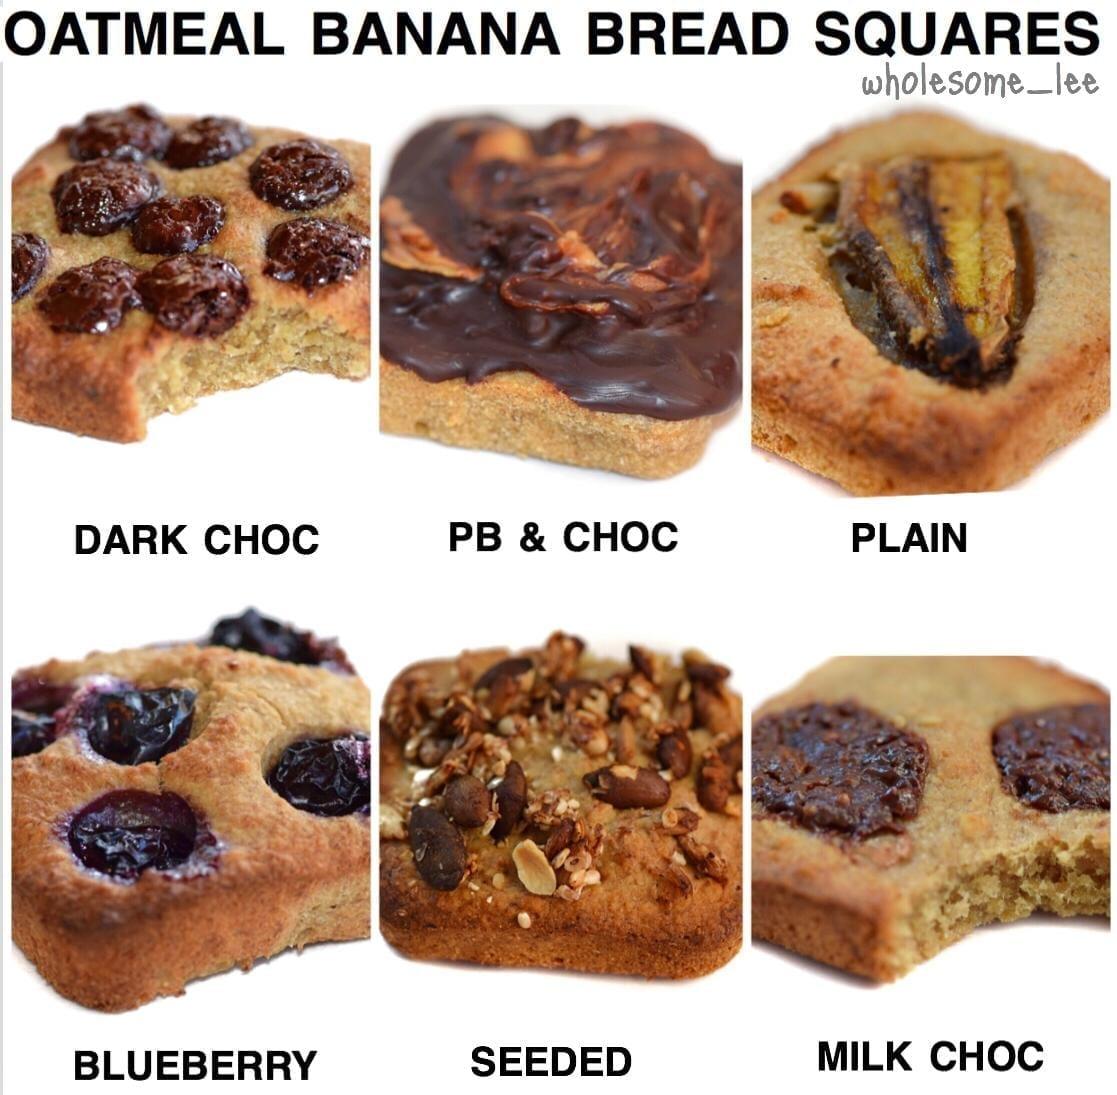 Oatmeal Banana Bread Squares